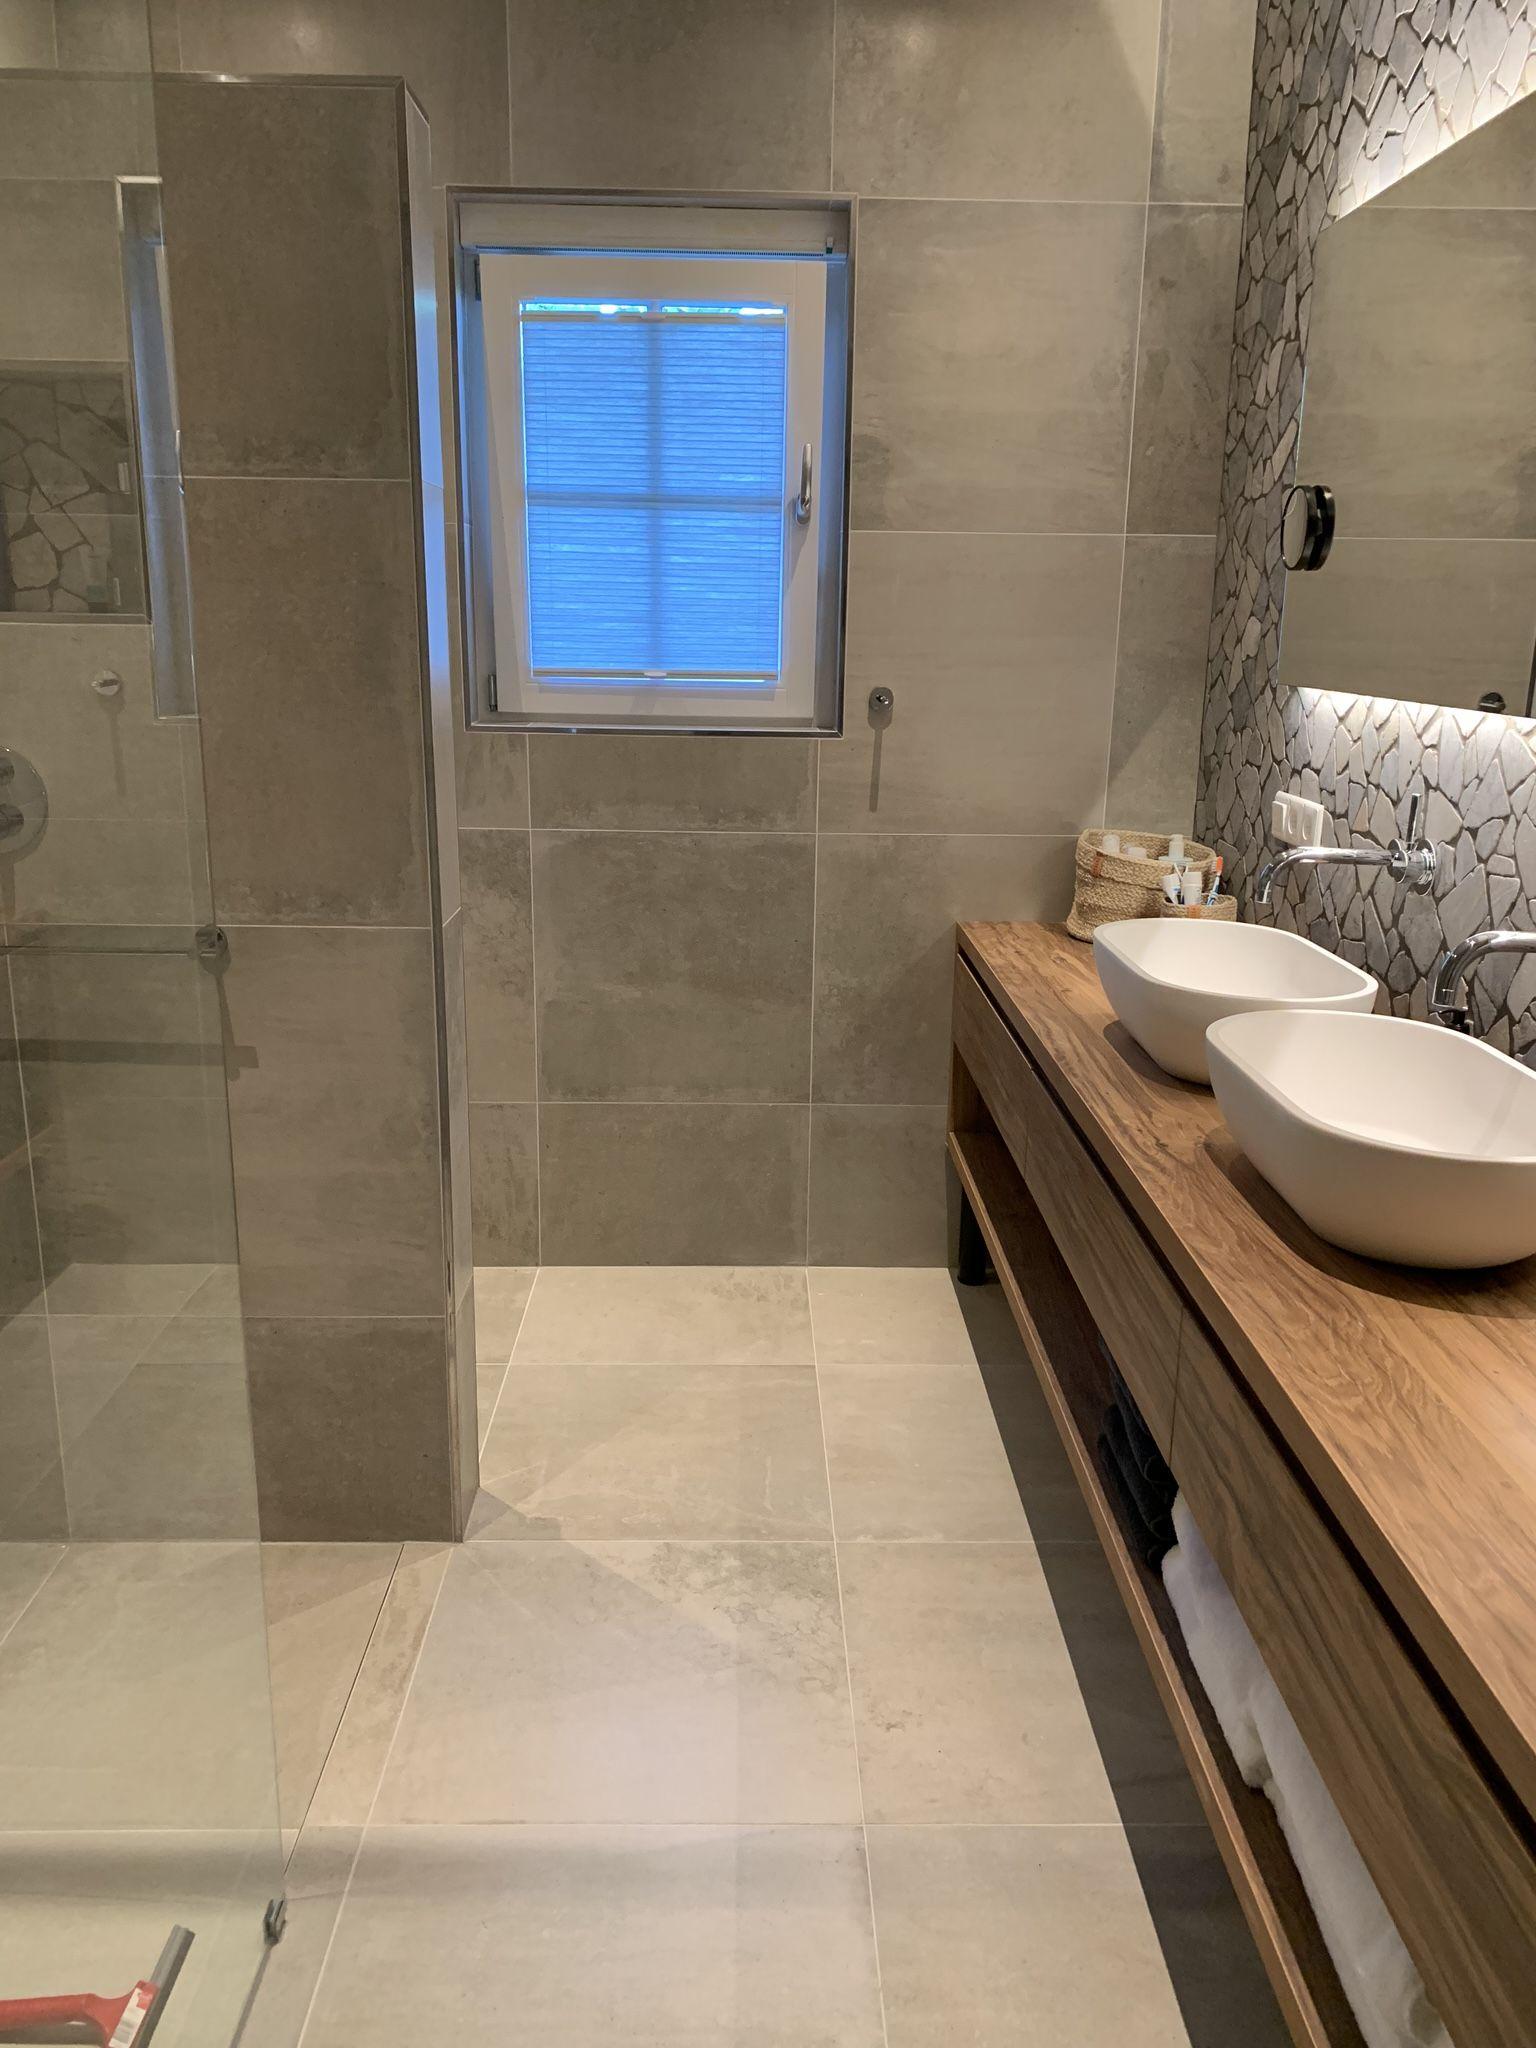 Badkamer Compleet Modern Beton Look Tegels Maatwerk Meubel En Sanitair Badkamer Badkamer Betegelen Badkamer Tegelen